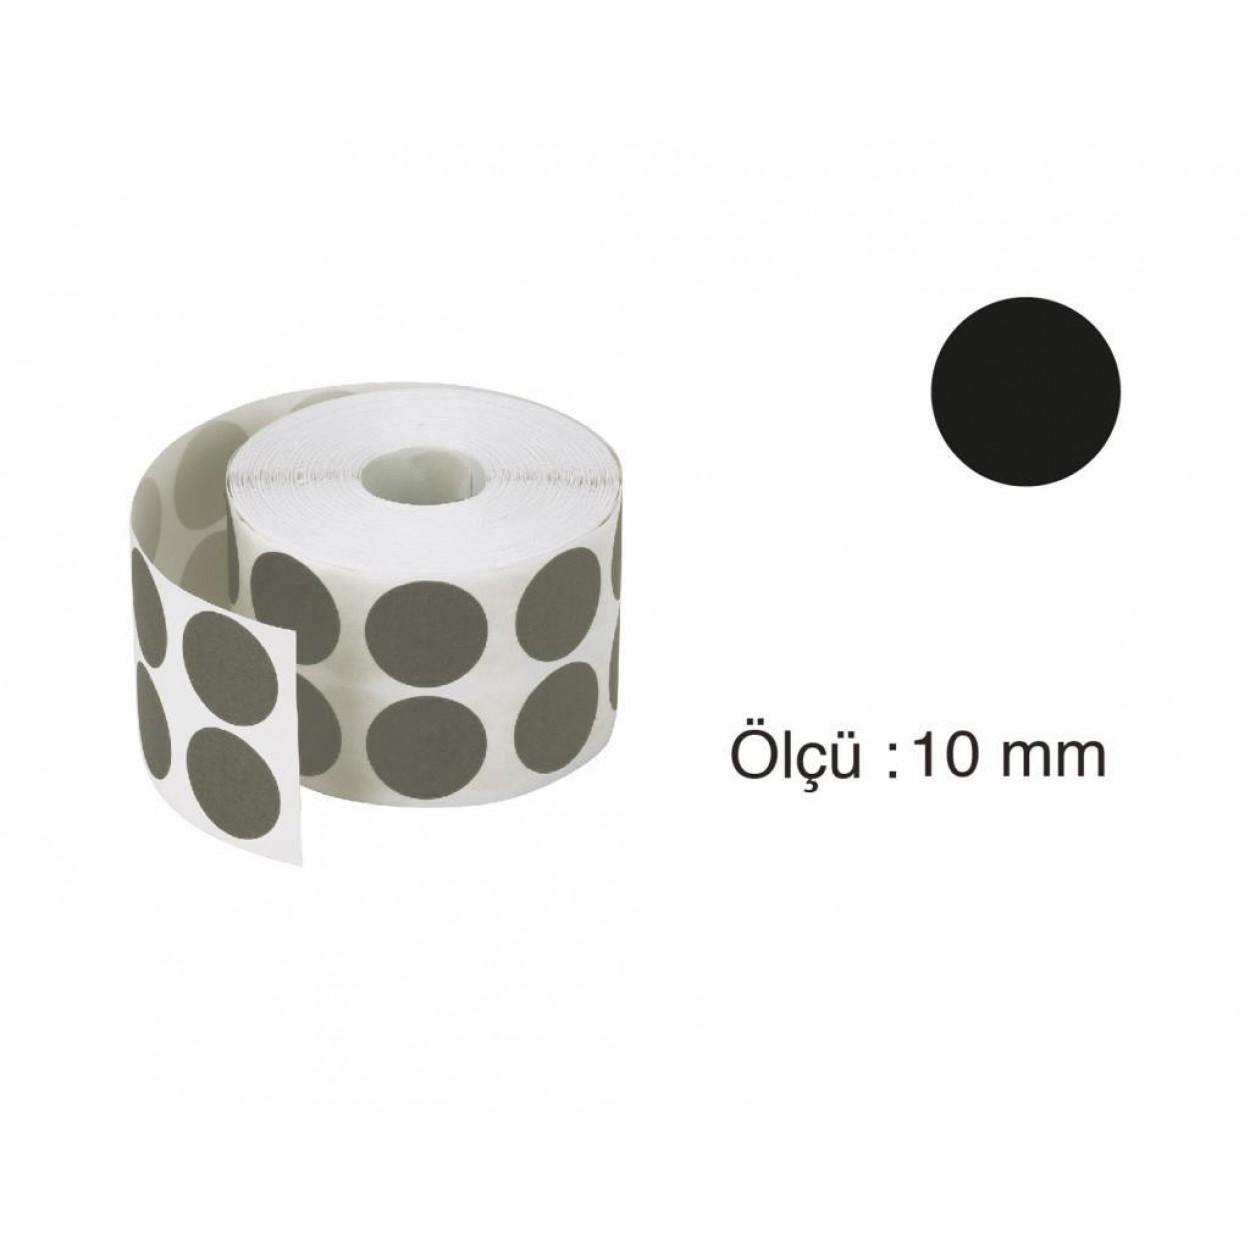 Tanex Nokta Etiket 10 mm 5000 Adet Siyah